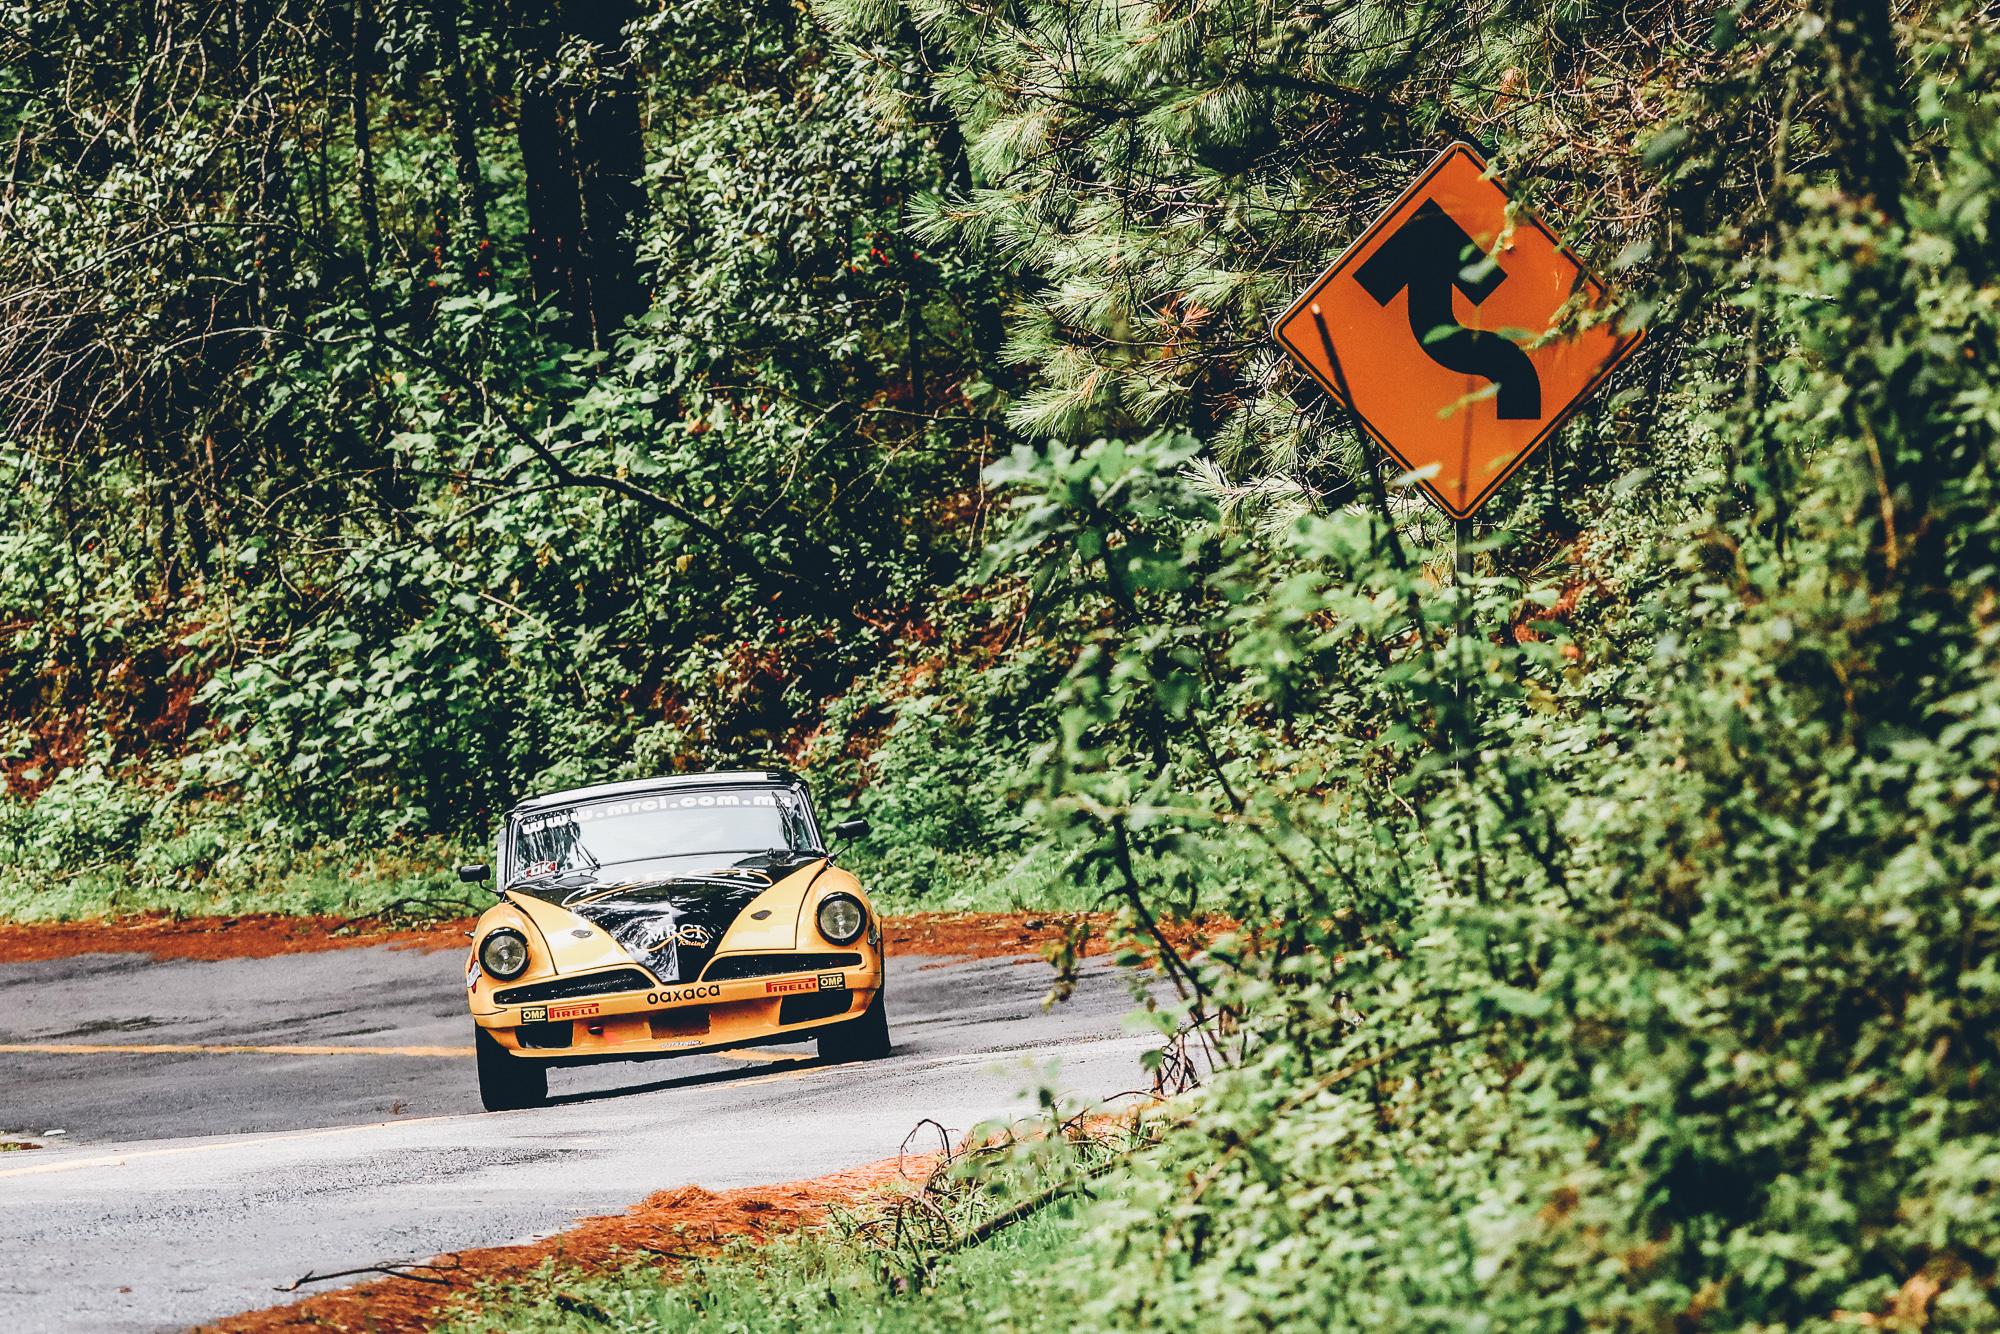 LA CARRERA PANAMERICANA IS STILL THE ULTIMATE ROAD RACE.